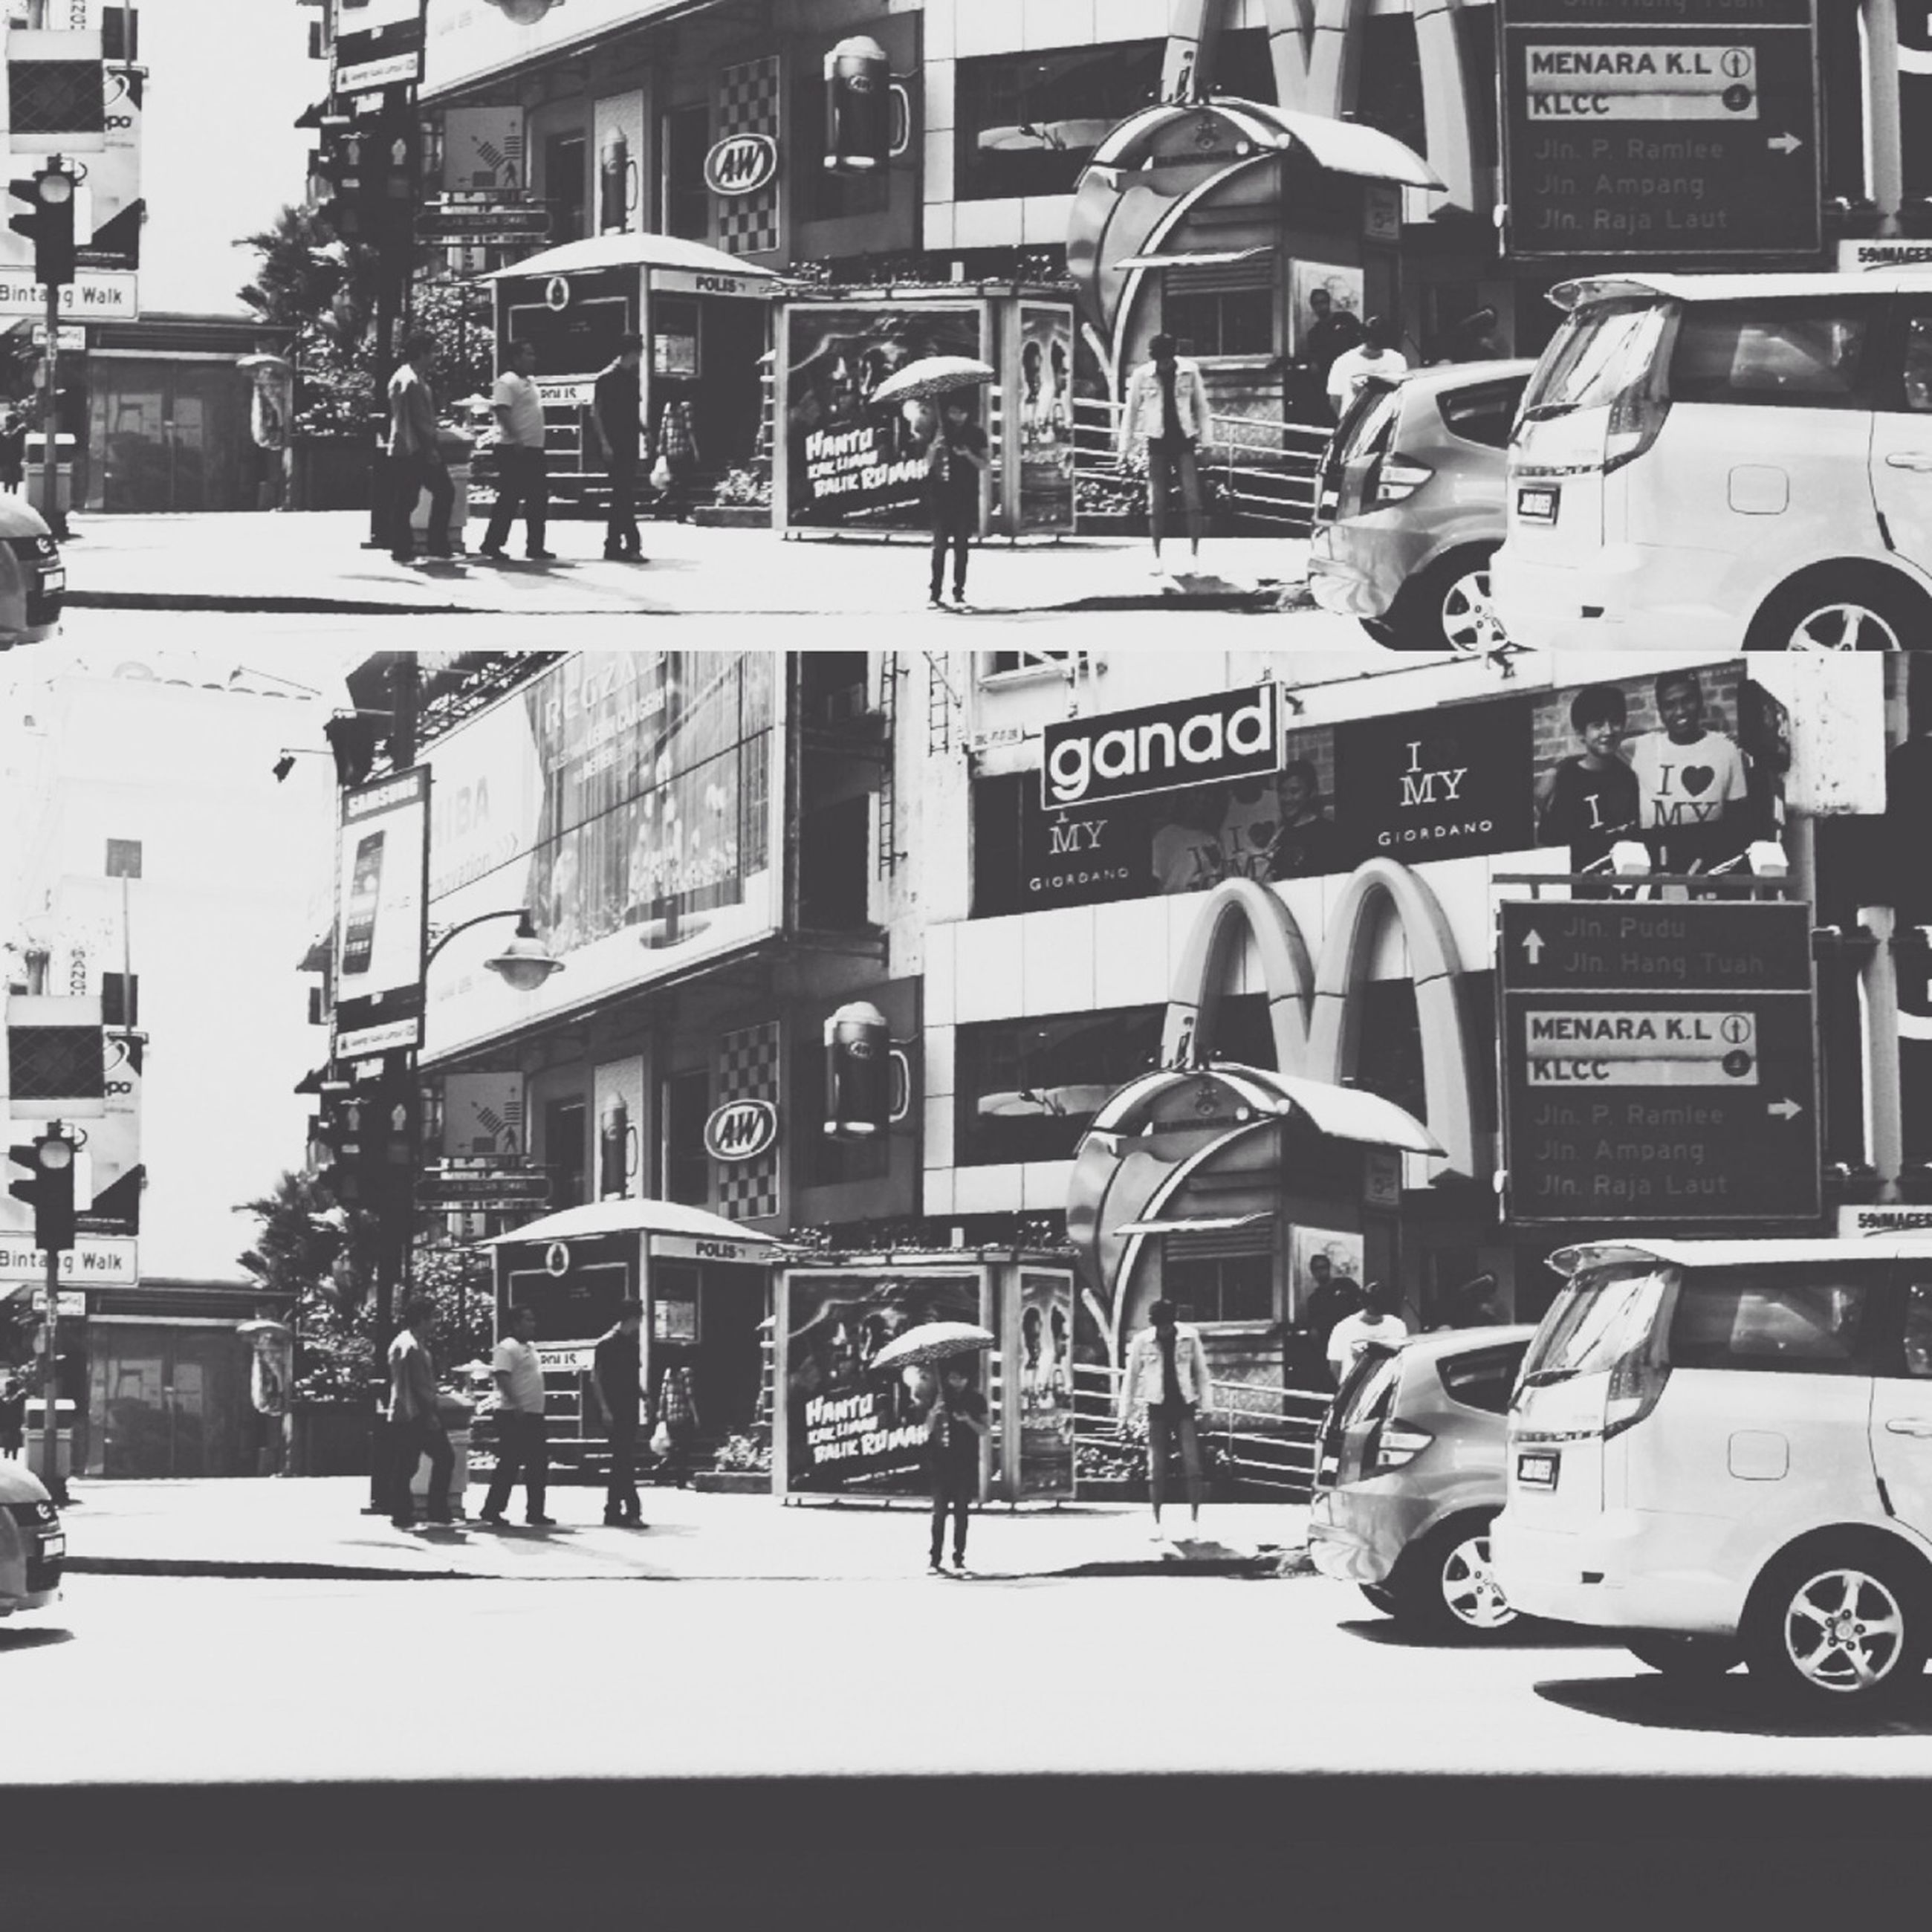 transportation, building exterior, street, architecture, built structure, city, land vehicle, mode of transport, lifestyles, men, city life, car, text, communication, full length, road, leisure activity, walking